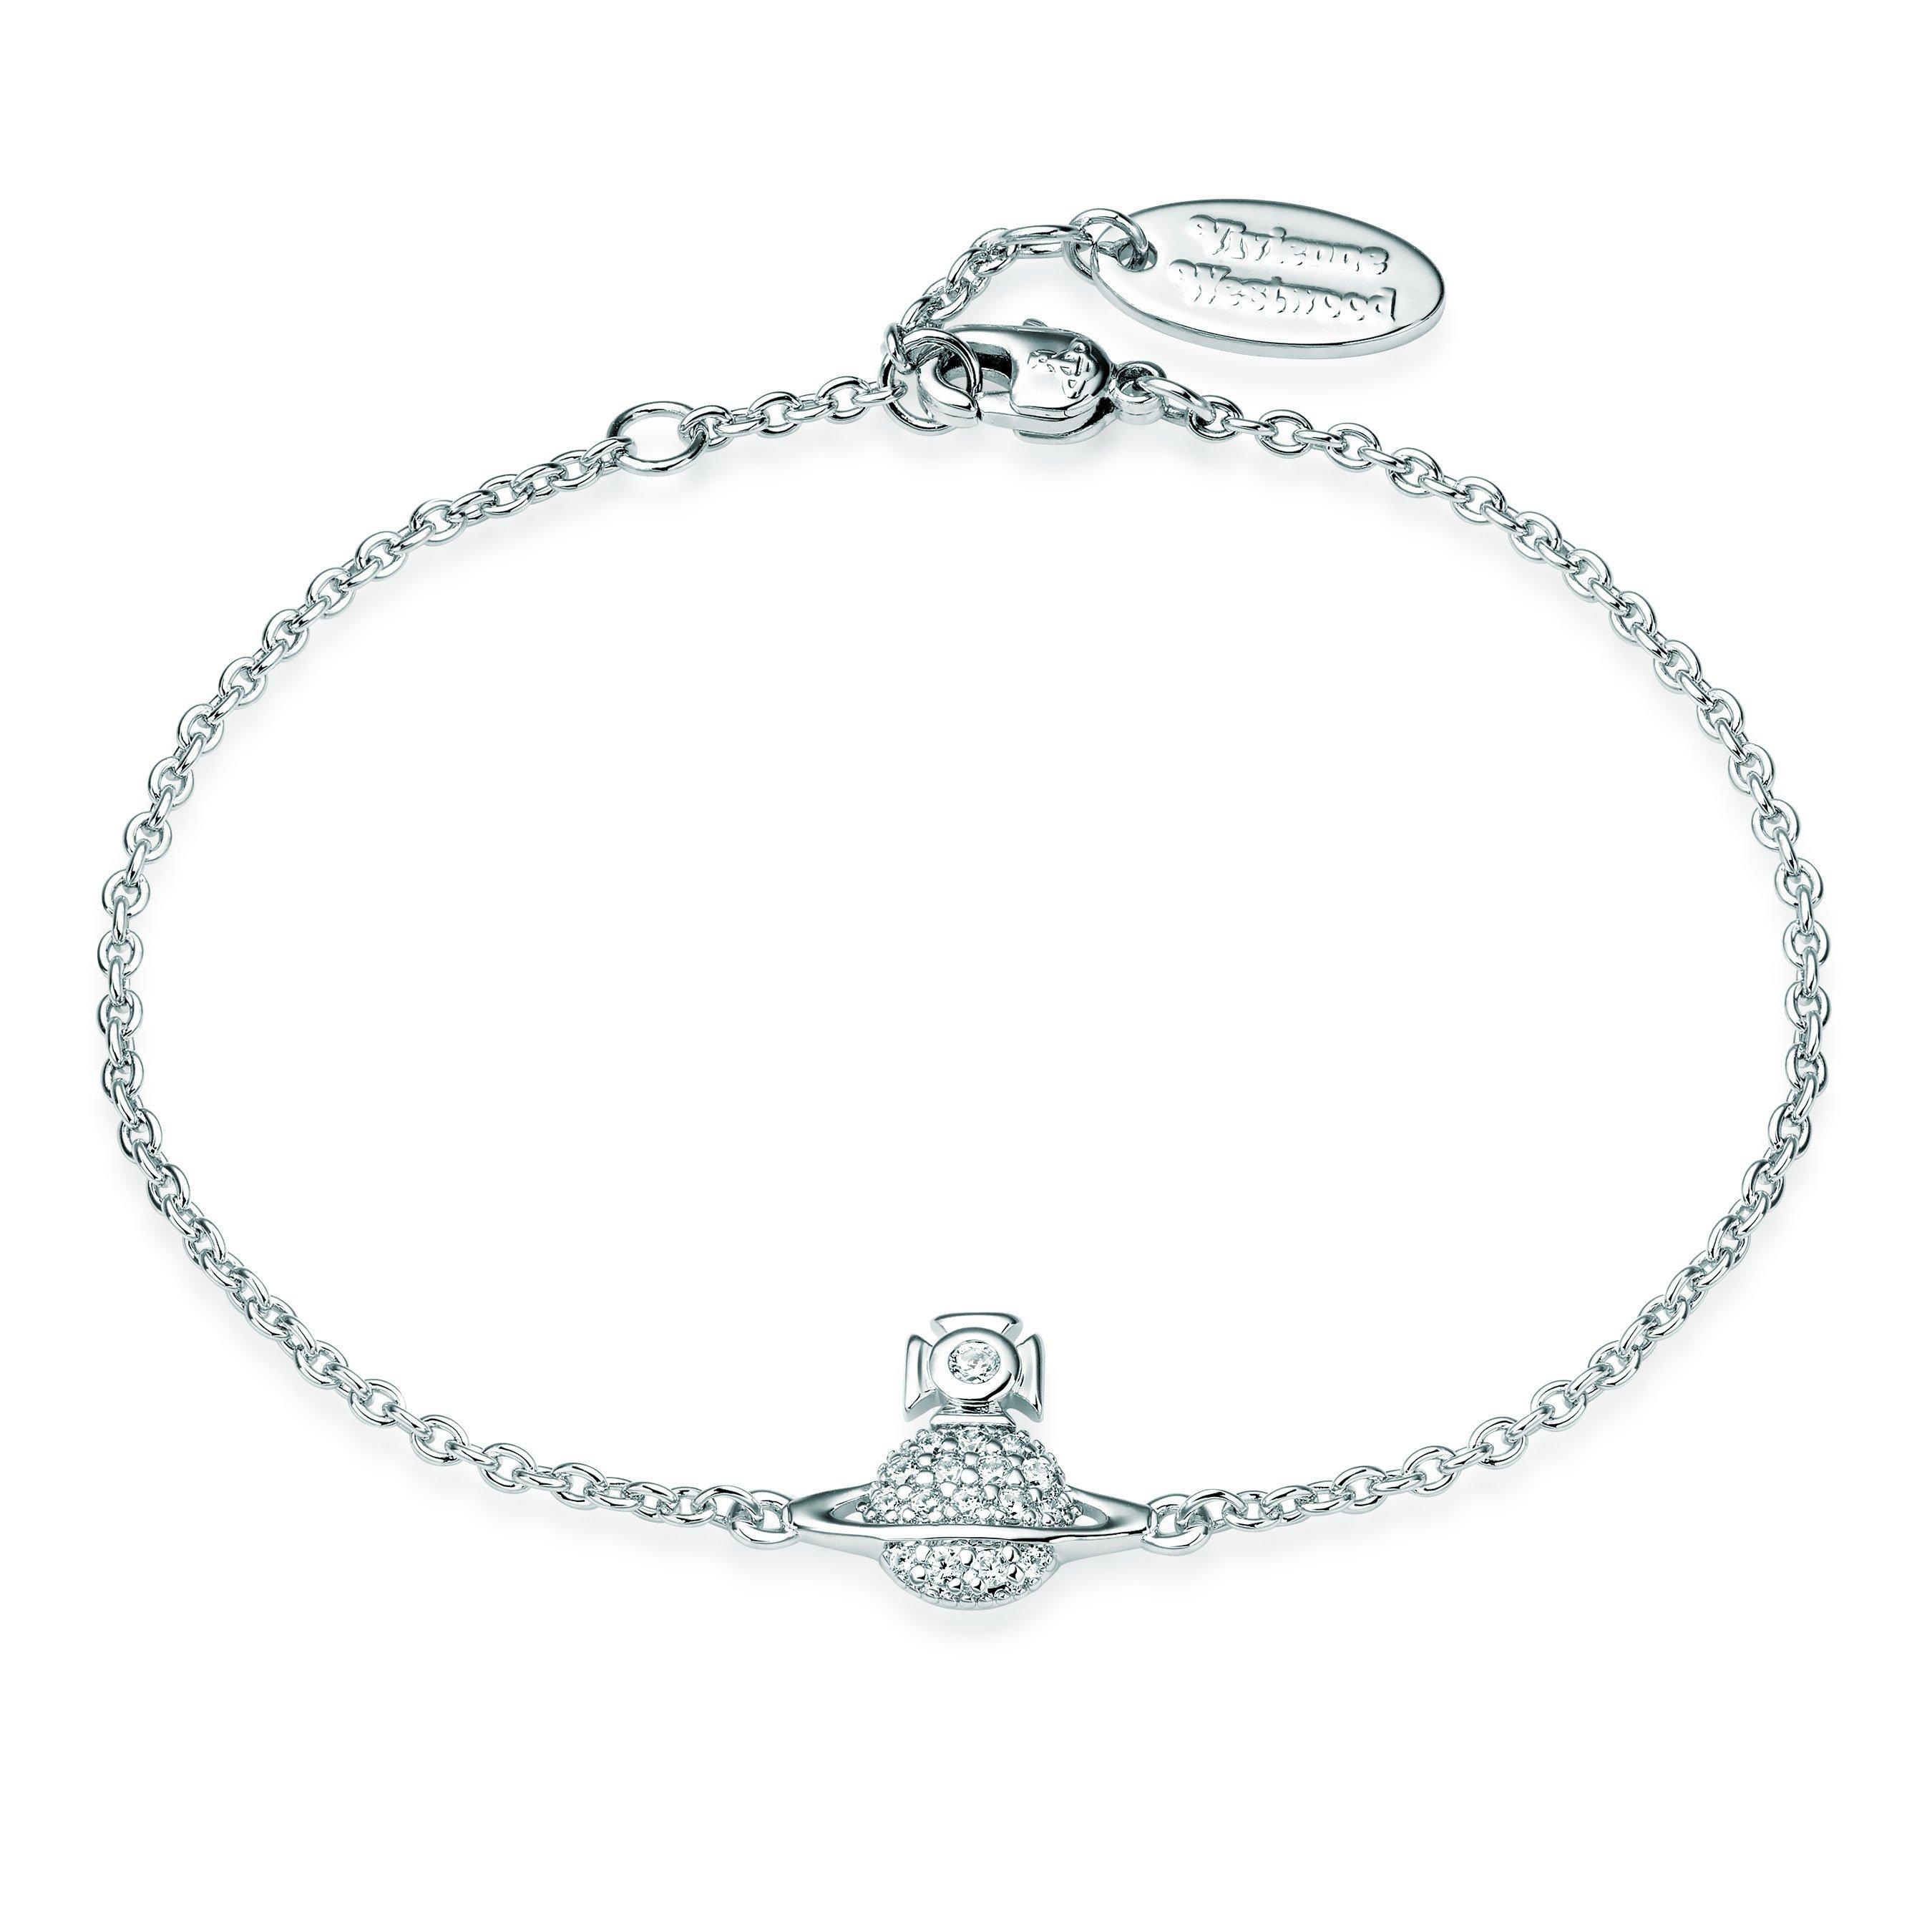 Vivienne Westwood Tamia Silver Tone Bracelet